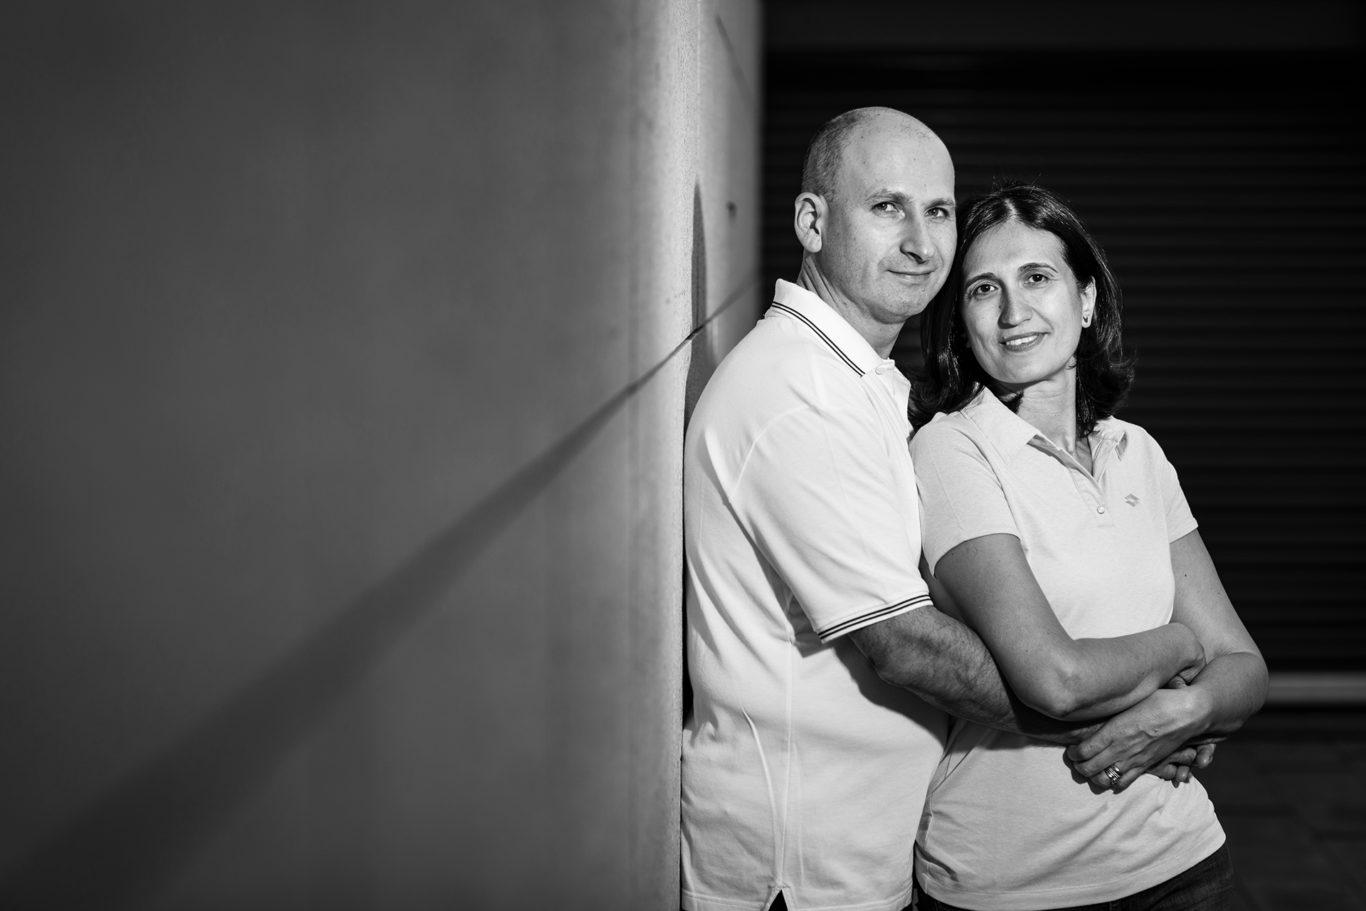 Fotografii de familie alb-negru - Ciprian Dumitrescu - fotograf familie